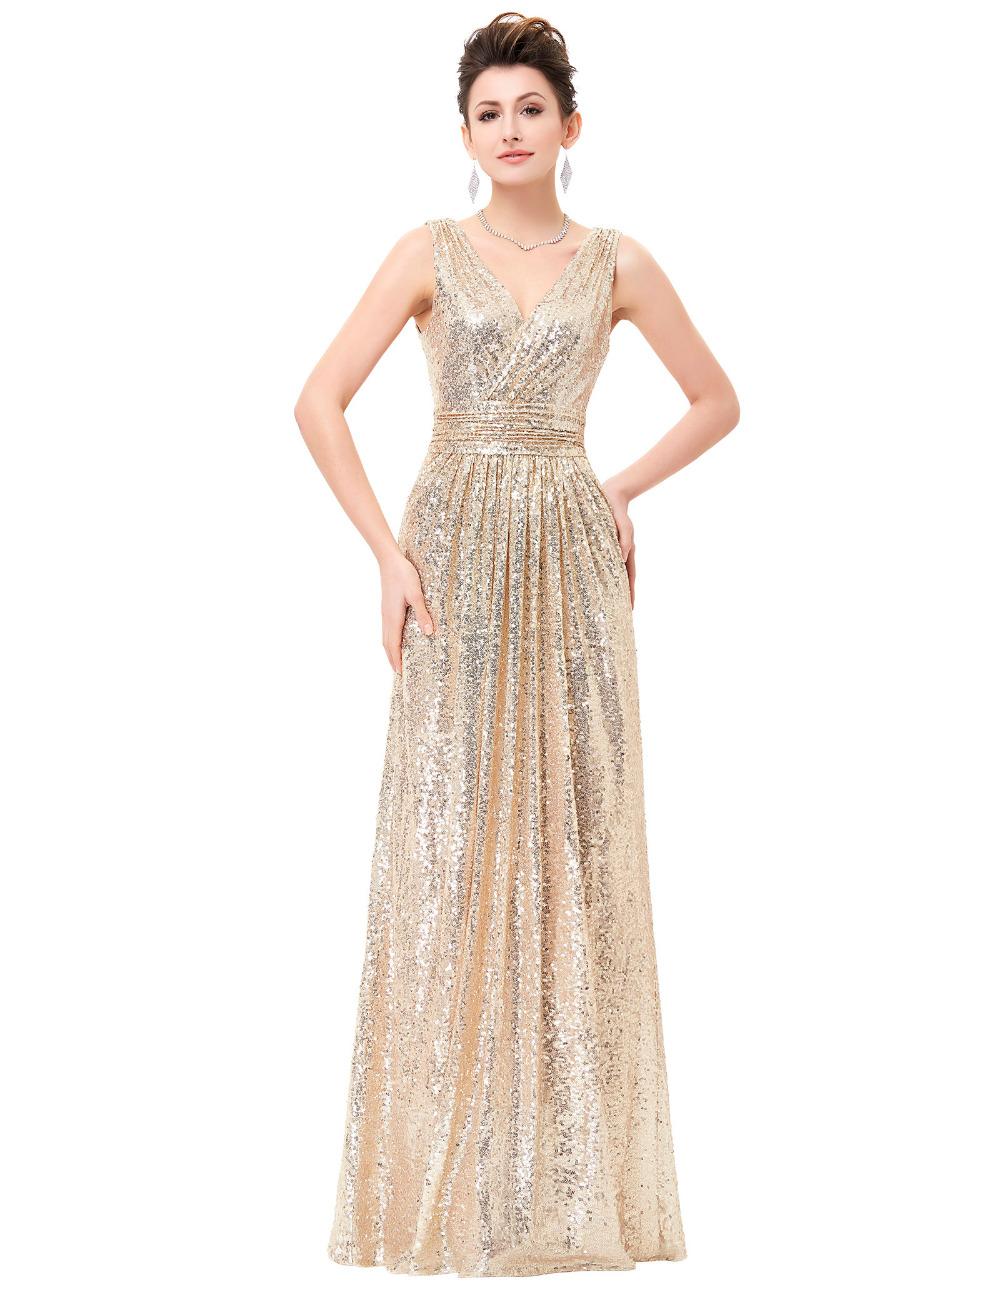 Cheap Long Evening Dresses 2016 V Neck Light Gold Rose Gold Silver Wedding Party Dress Vestido Formal Evening Dresses For Women(China (Mainland))